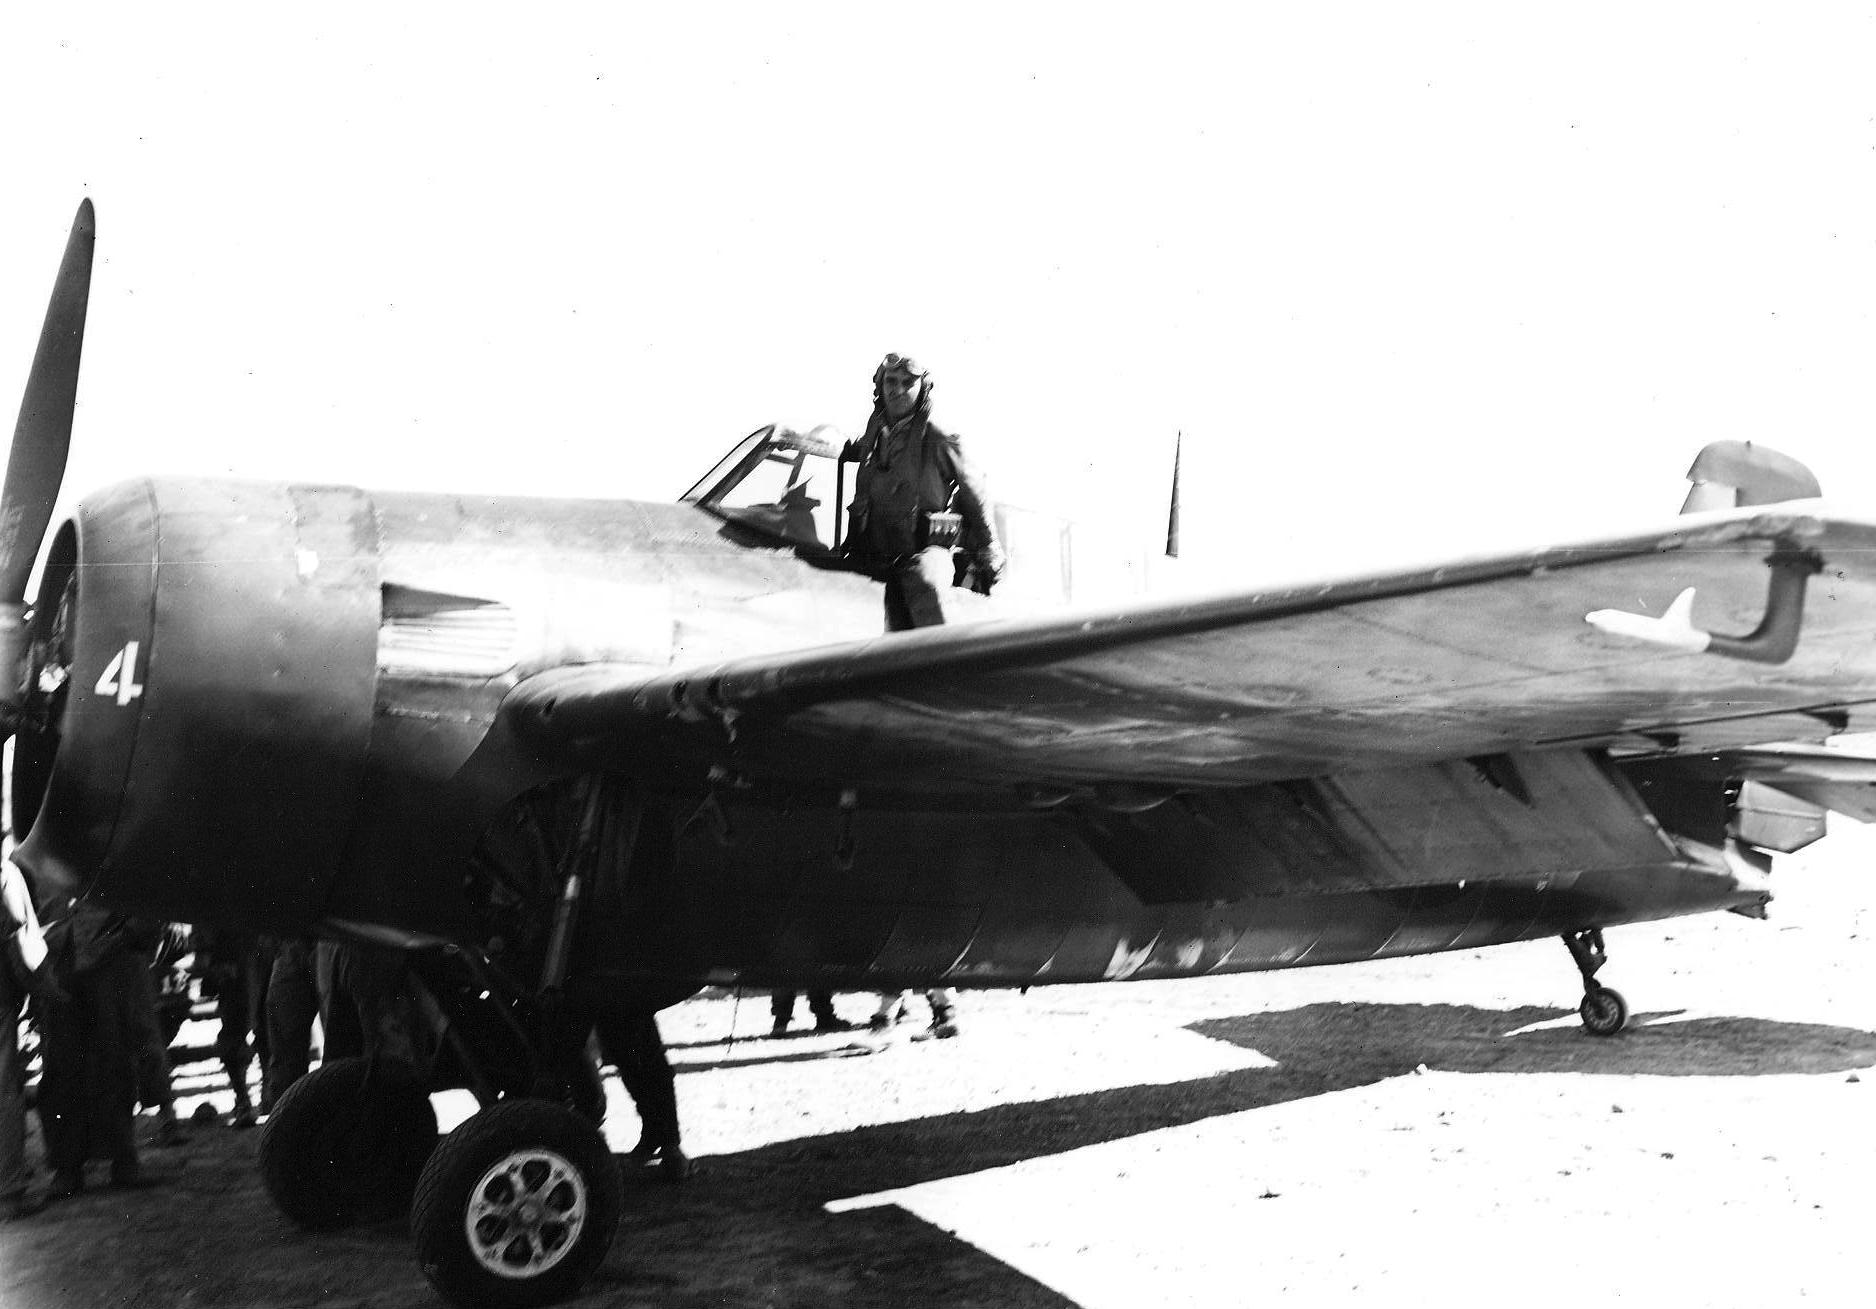 FM 2 Wildcat VC 76 White 4 LTJG Noah P Butt Jr first Wildcat to land on Motayama airfield 1 on Iwo Jima Mar 1945 01